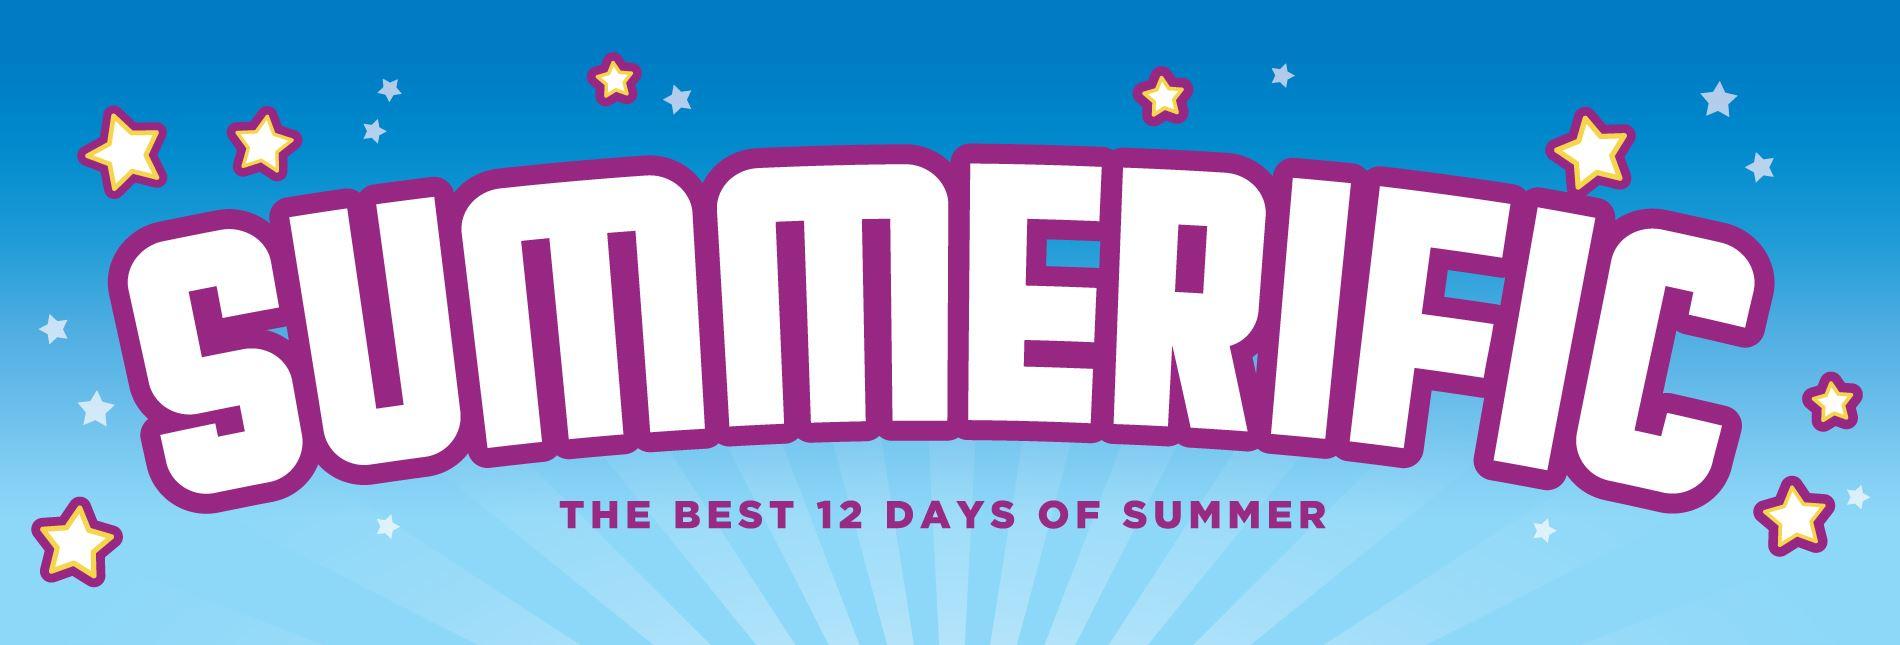 Summerific Header Image